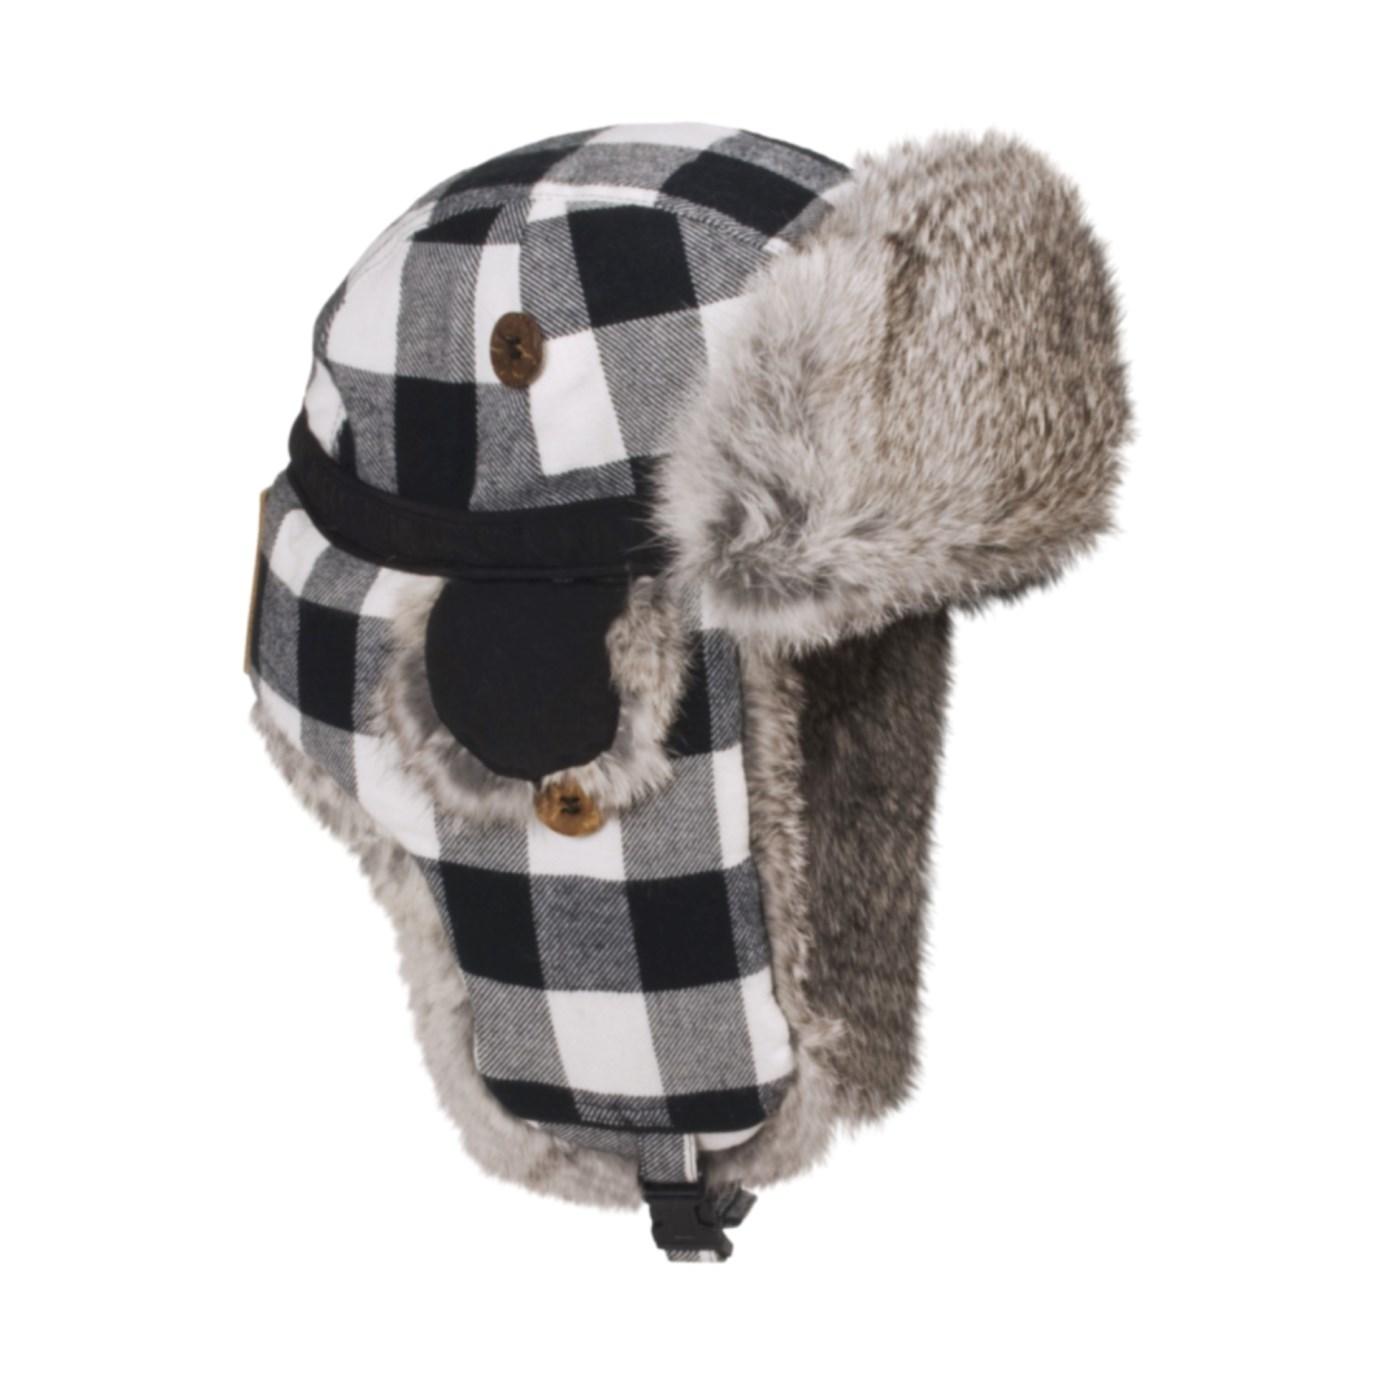 abc68ebaca6 Mad Bomber® Lil Flannel Aviator Hat Rabbit Fur (For Kids) in Black